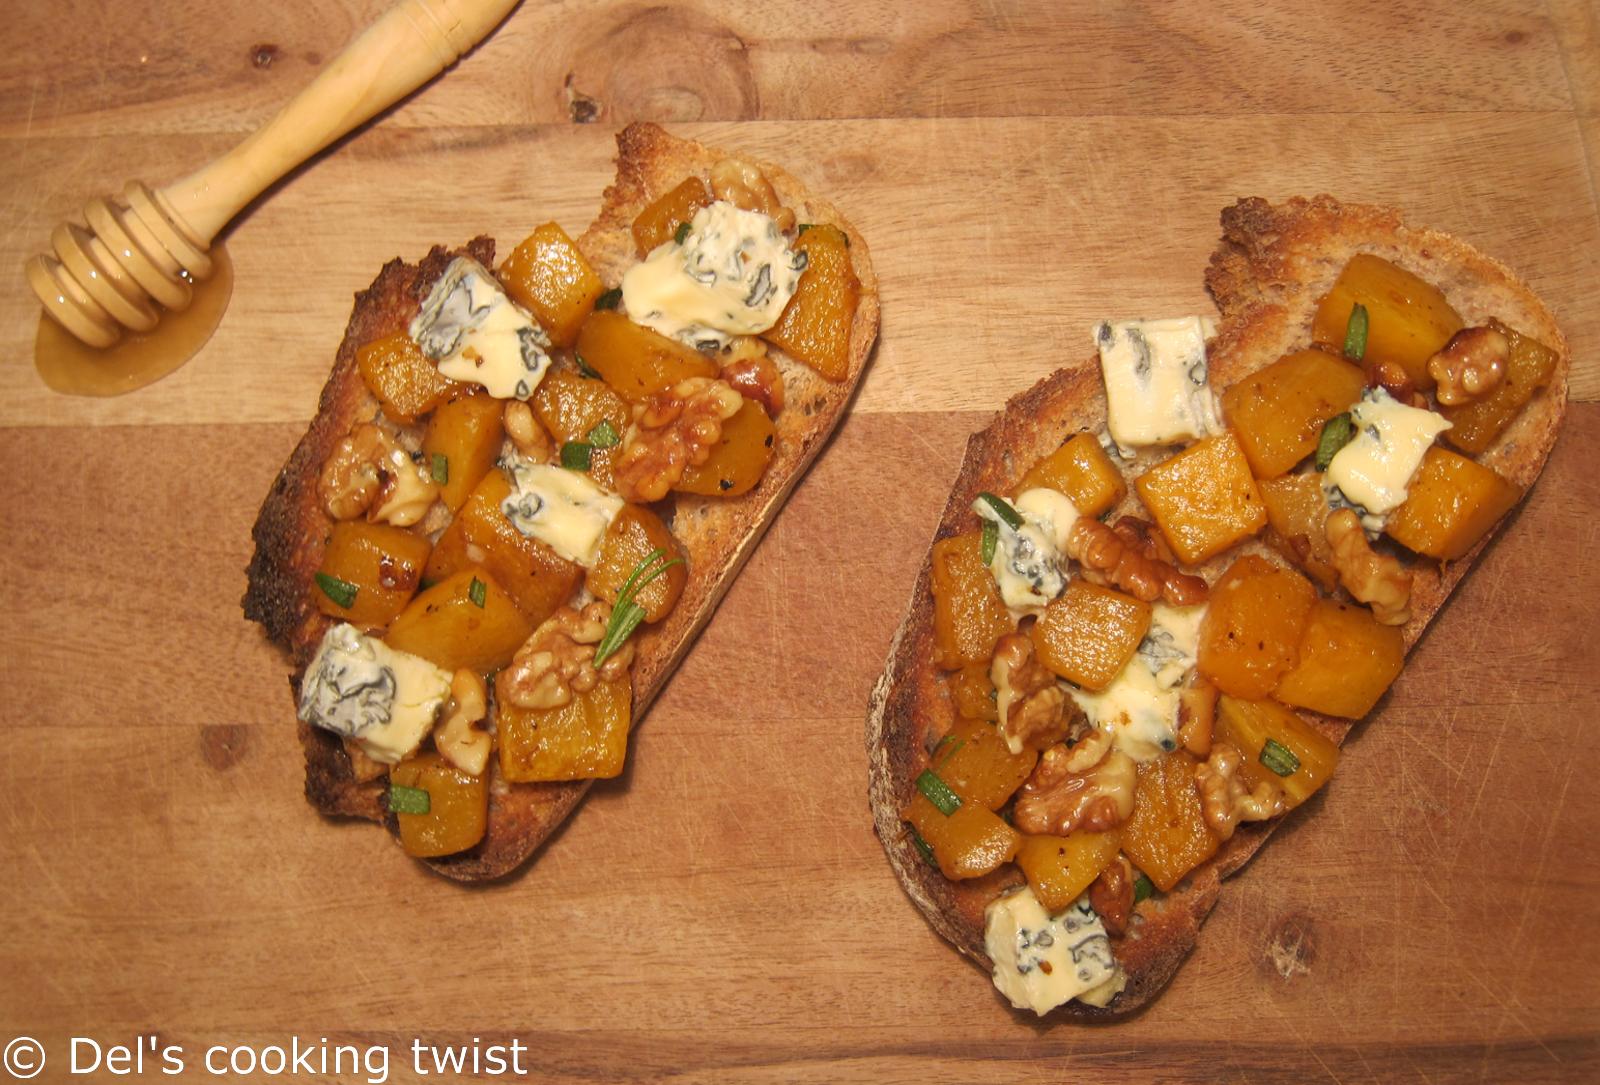 Pumpkin and Walnut Tartine with Blue Cheese